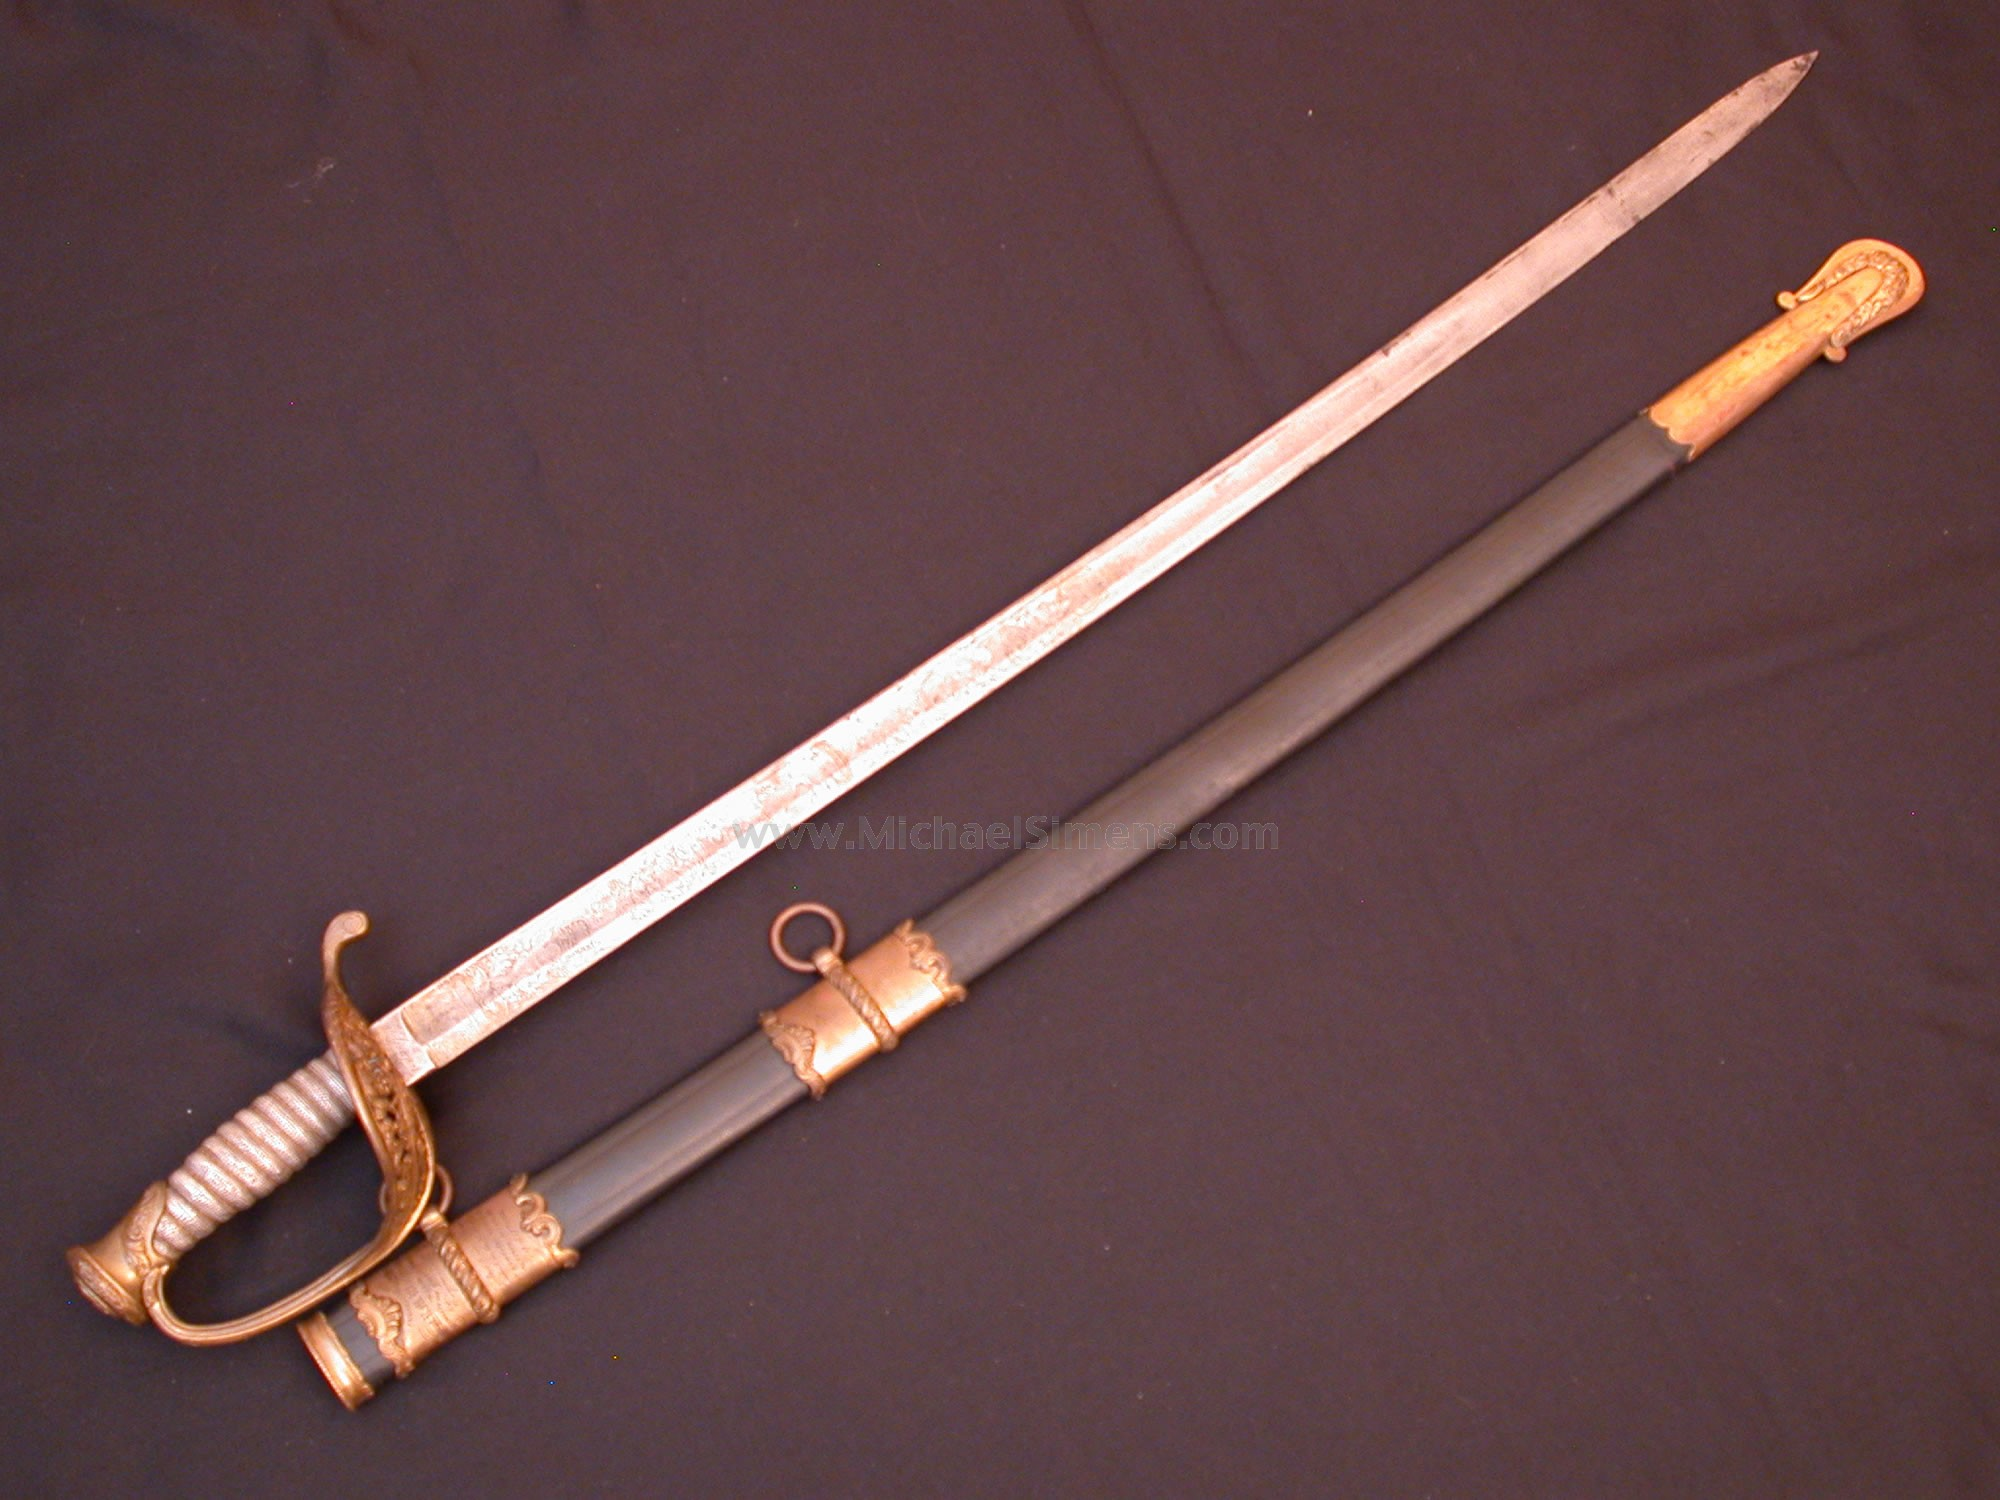 Schuyler, Hartley & Graham Presentation Officers Sword to